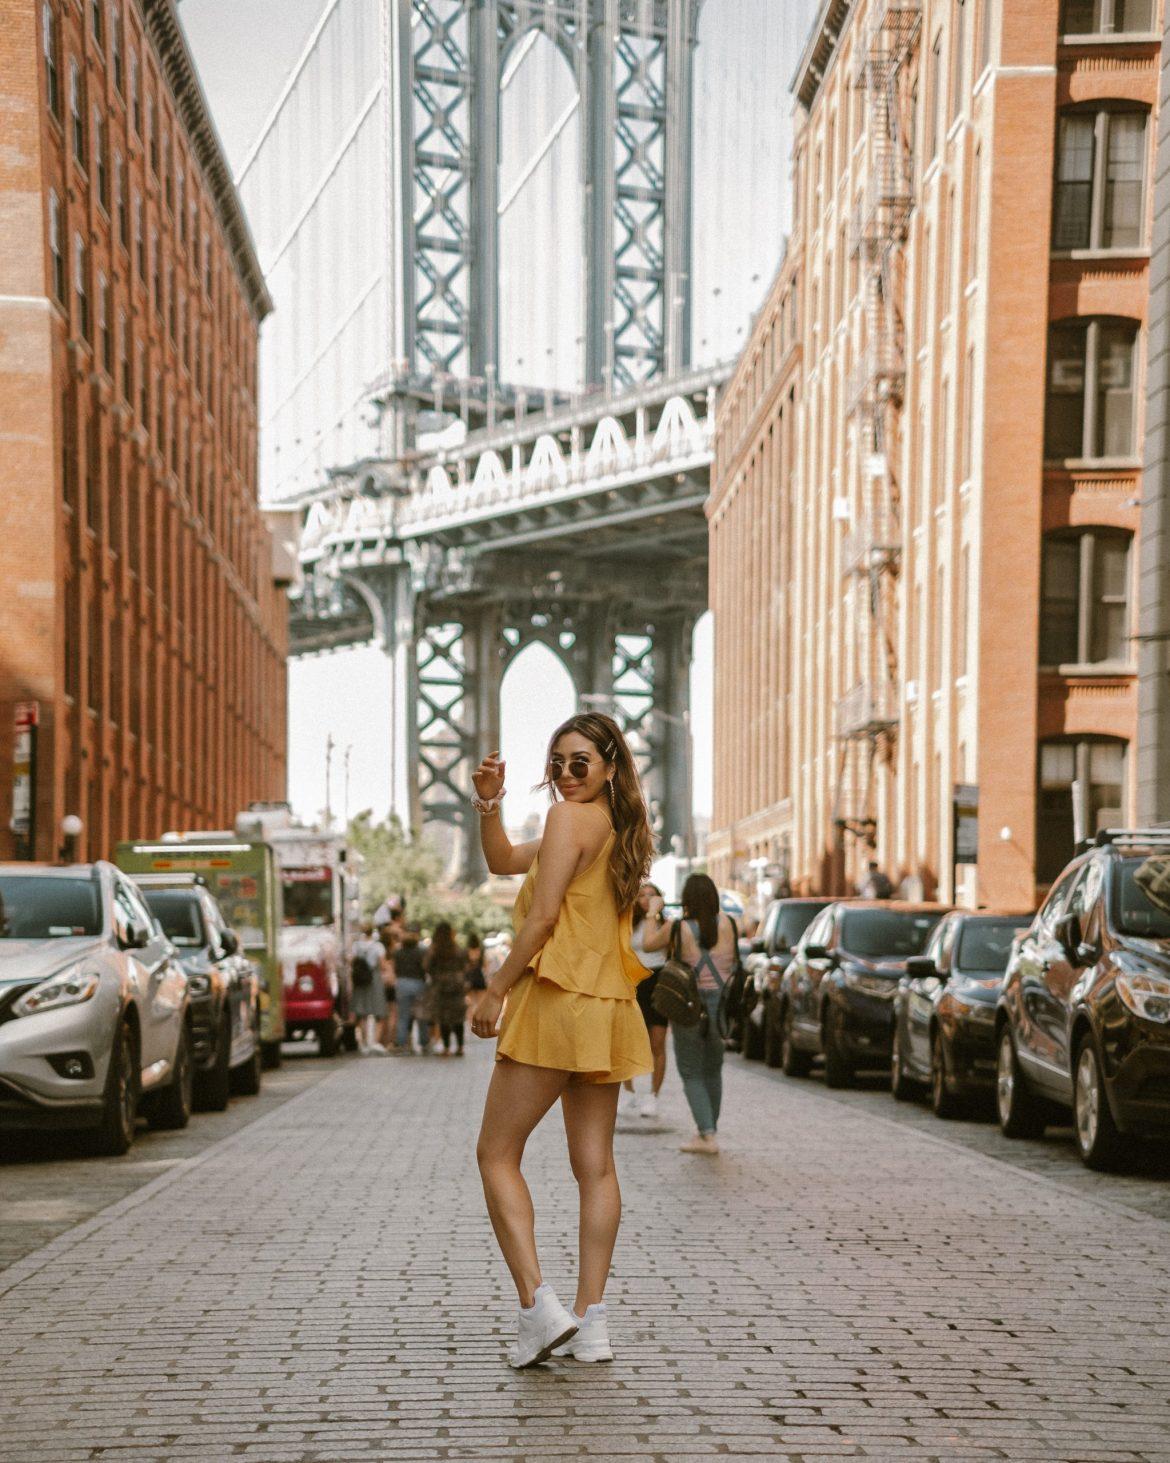 17 Best Instagram Worthy Spots in New York | DUMBO Manhattan Bridge